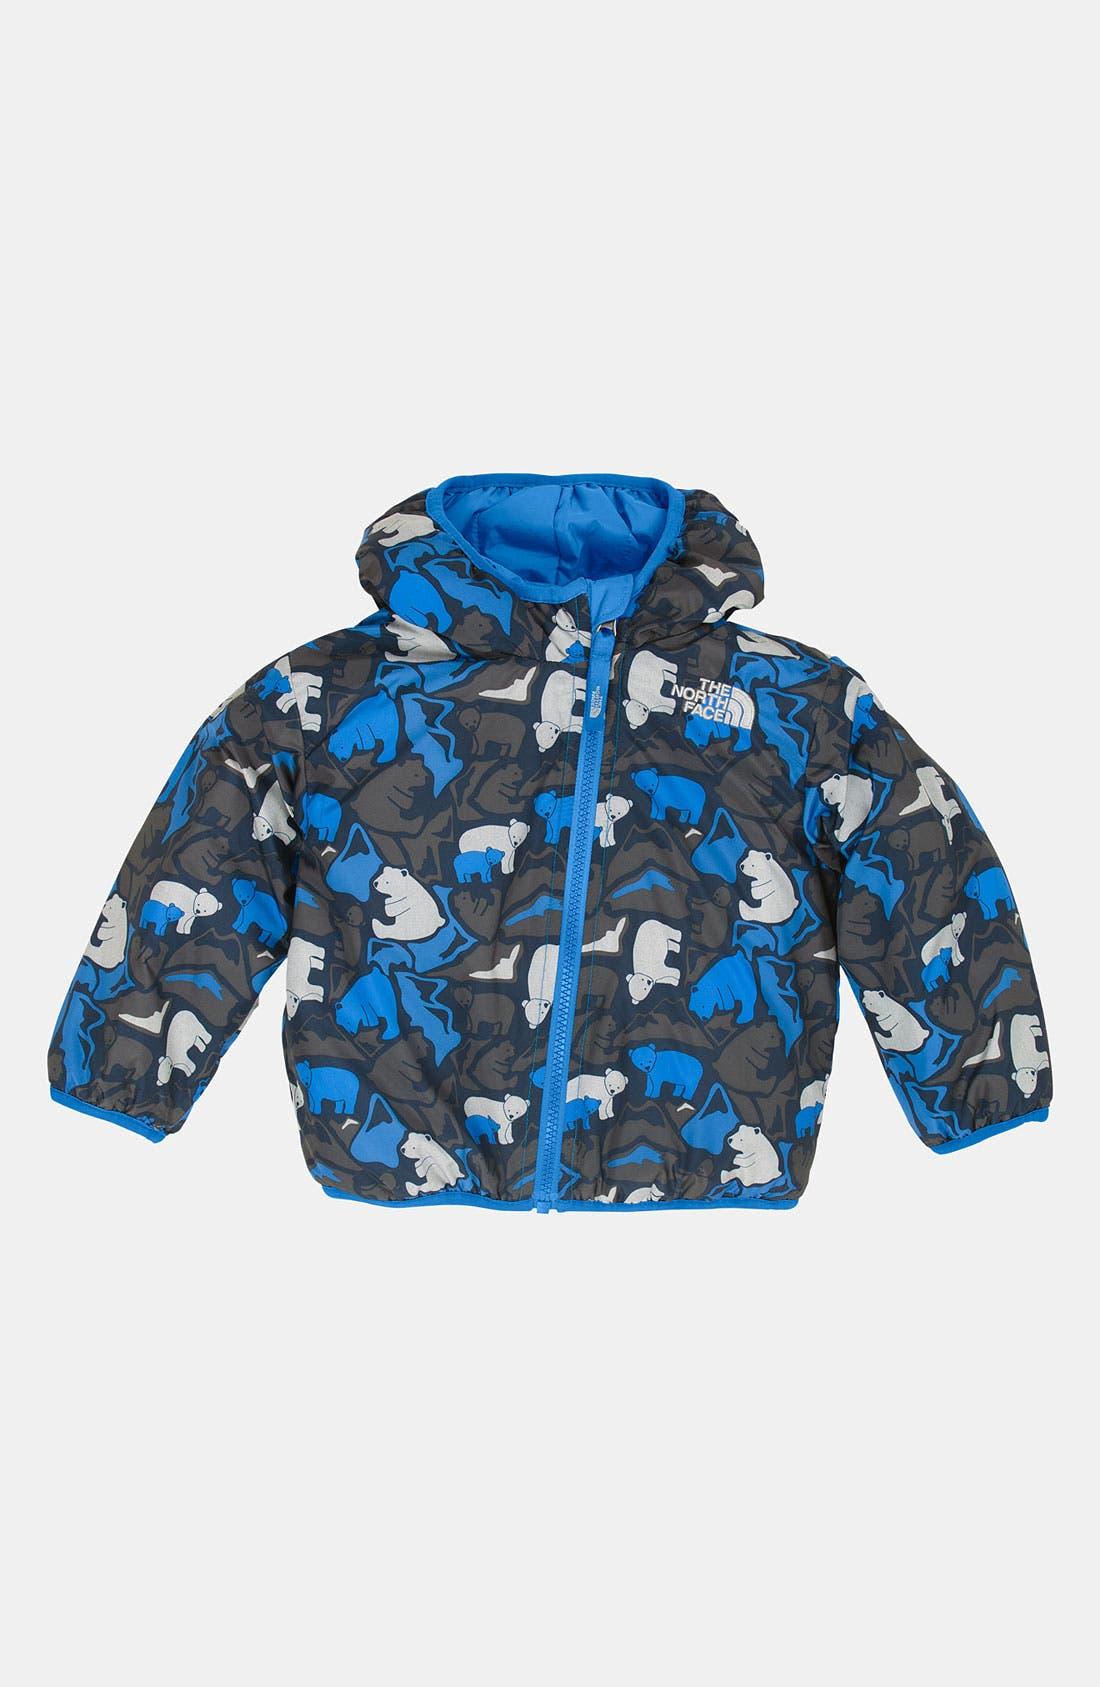 Main Image - The North Face 'Perrito' Reversible Jacket (Baby)